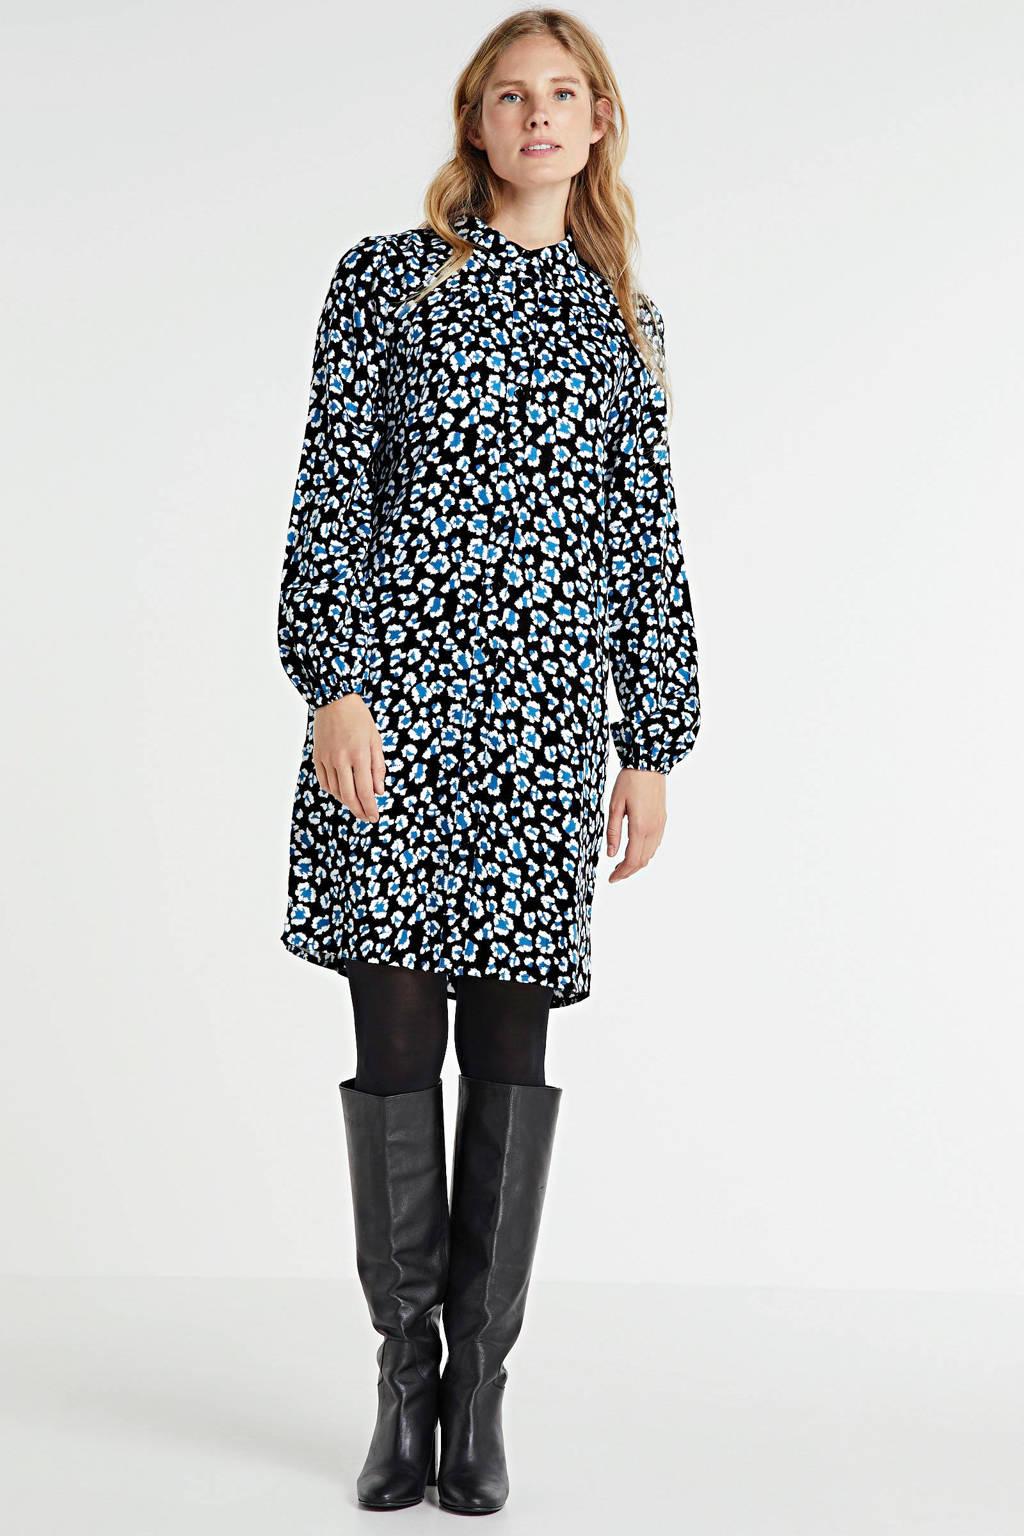 anytime blousejurk met panterprint print blauw/zwart, Zwart/blauw